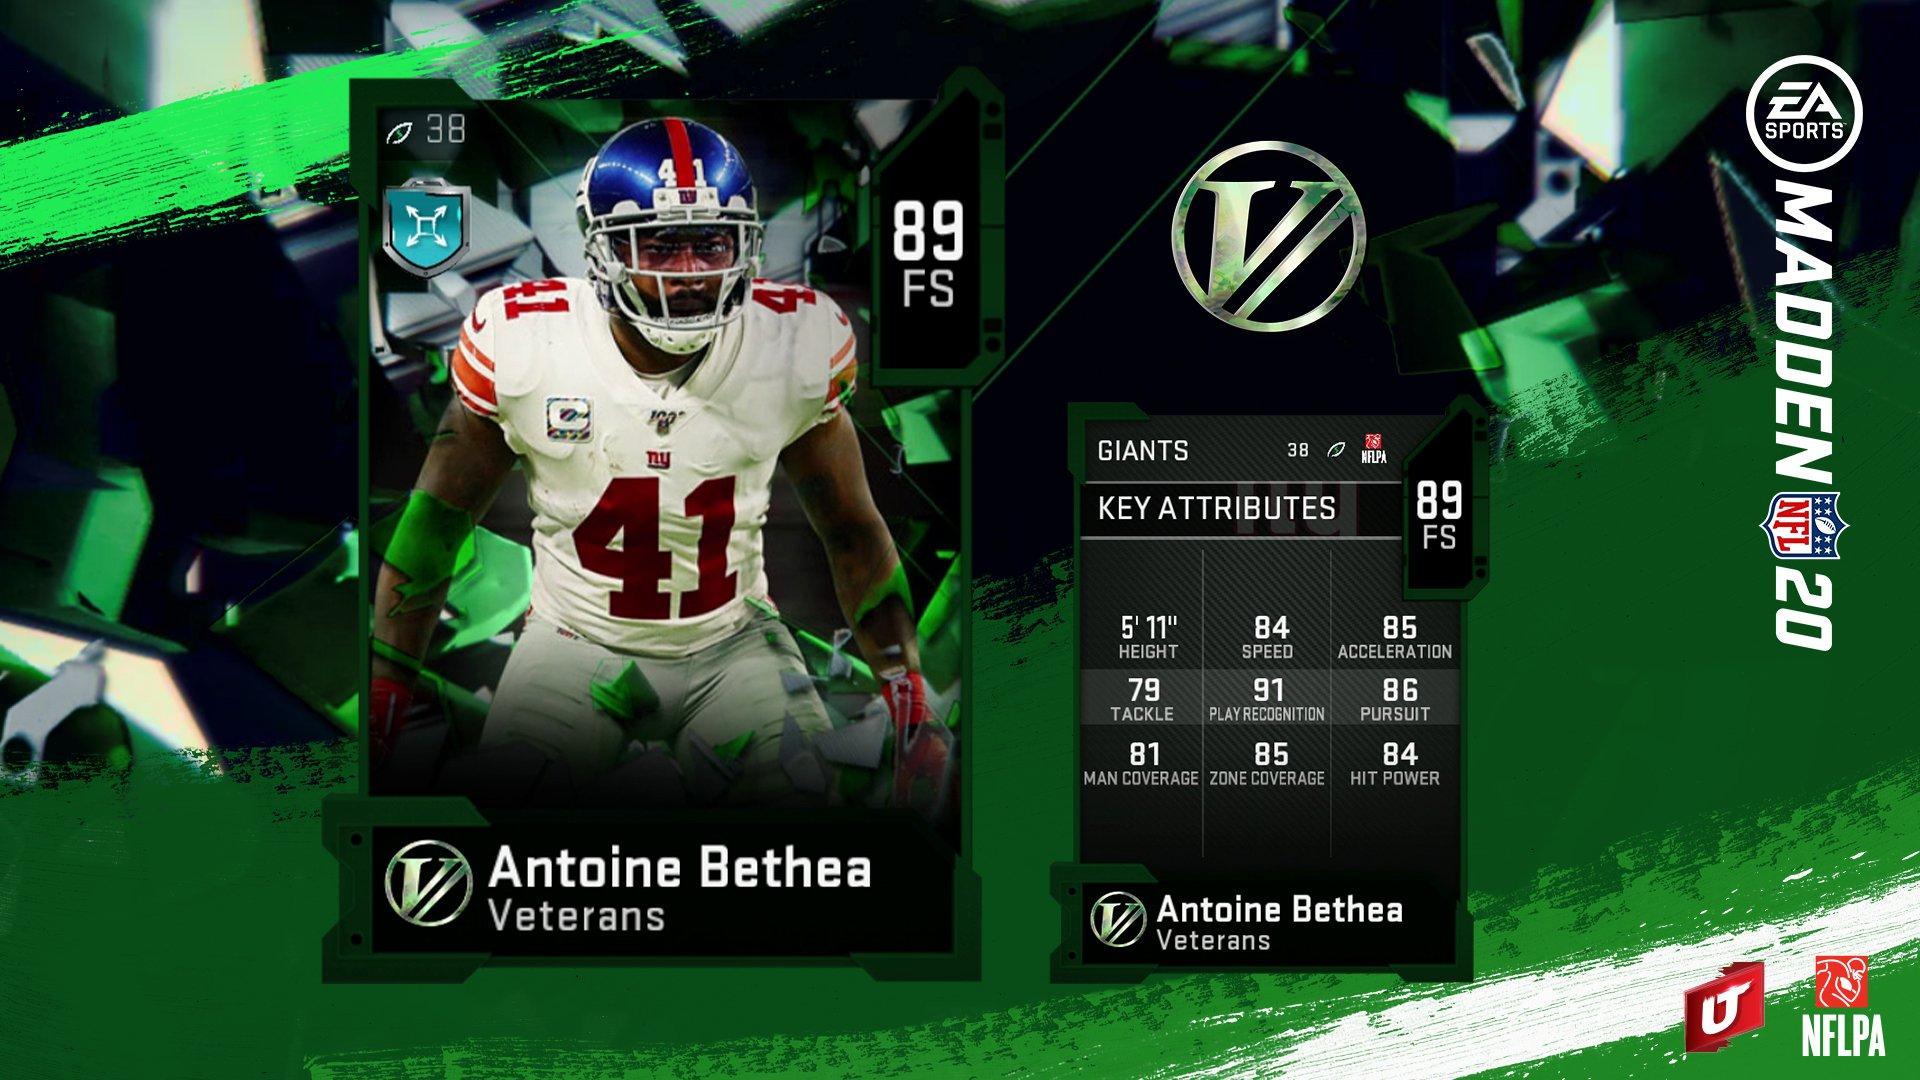 Antoine Bethea Hit